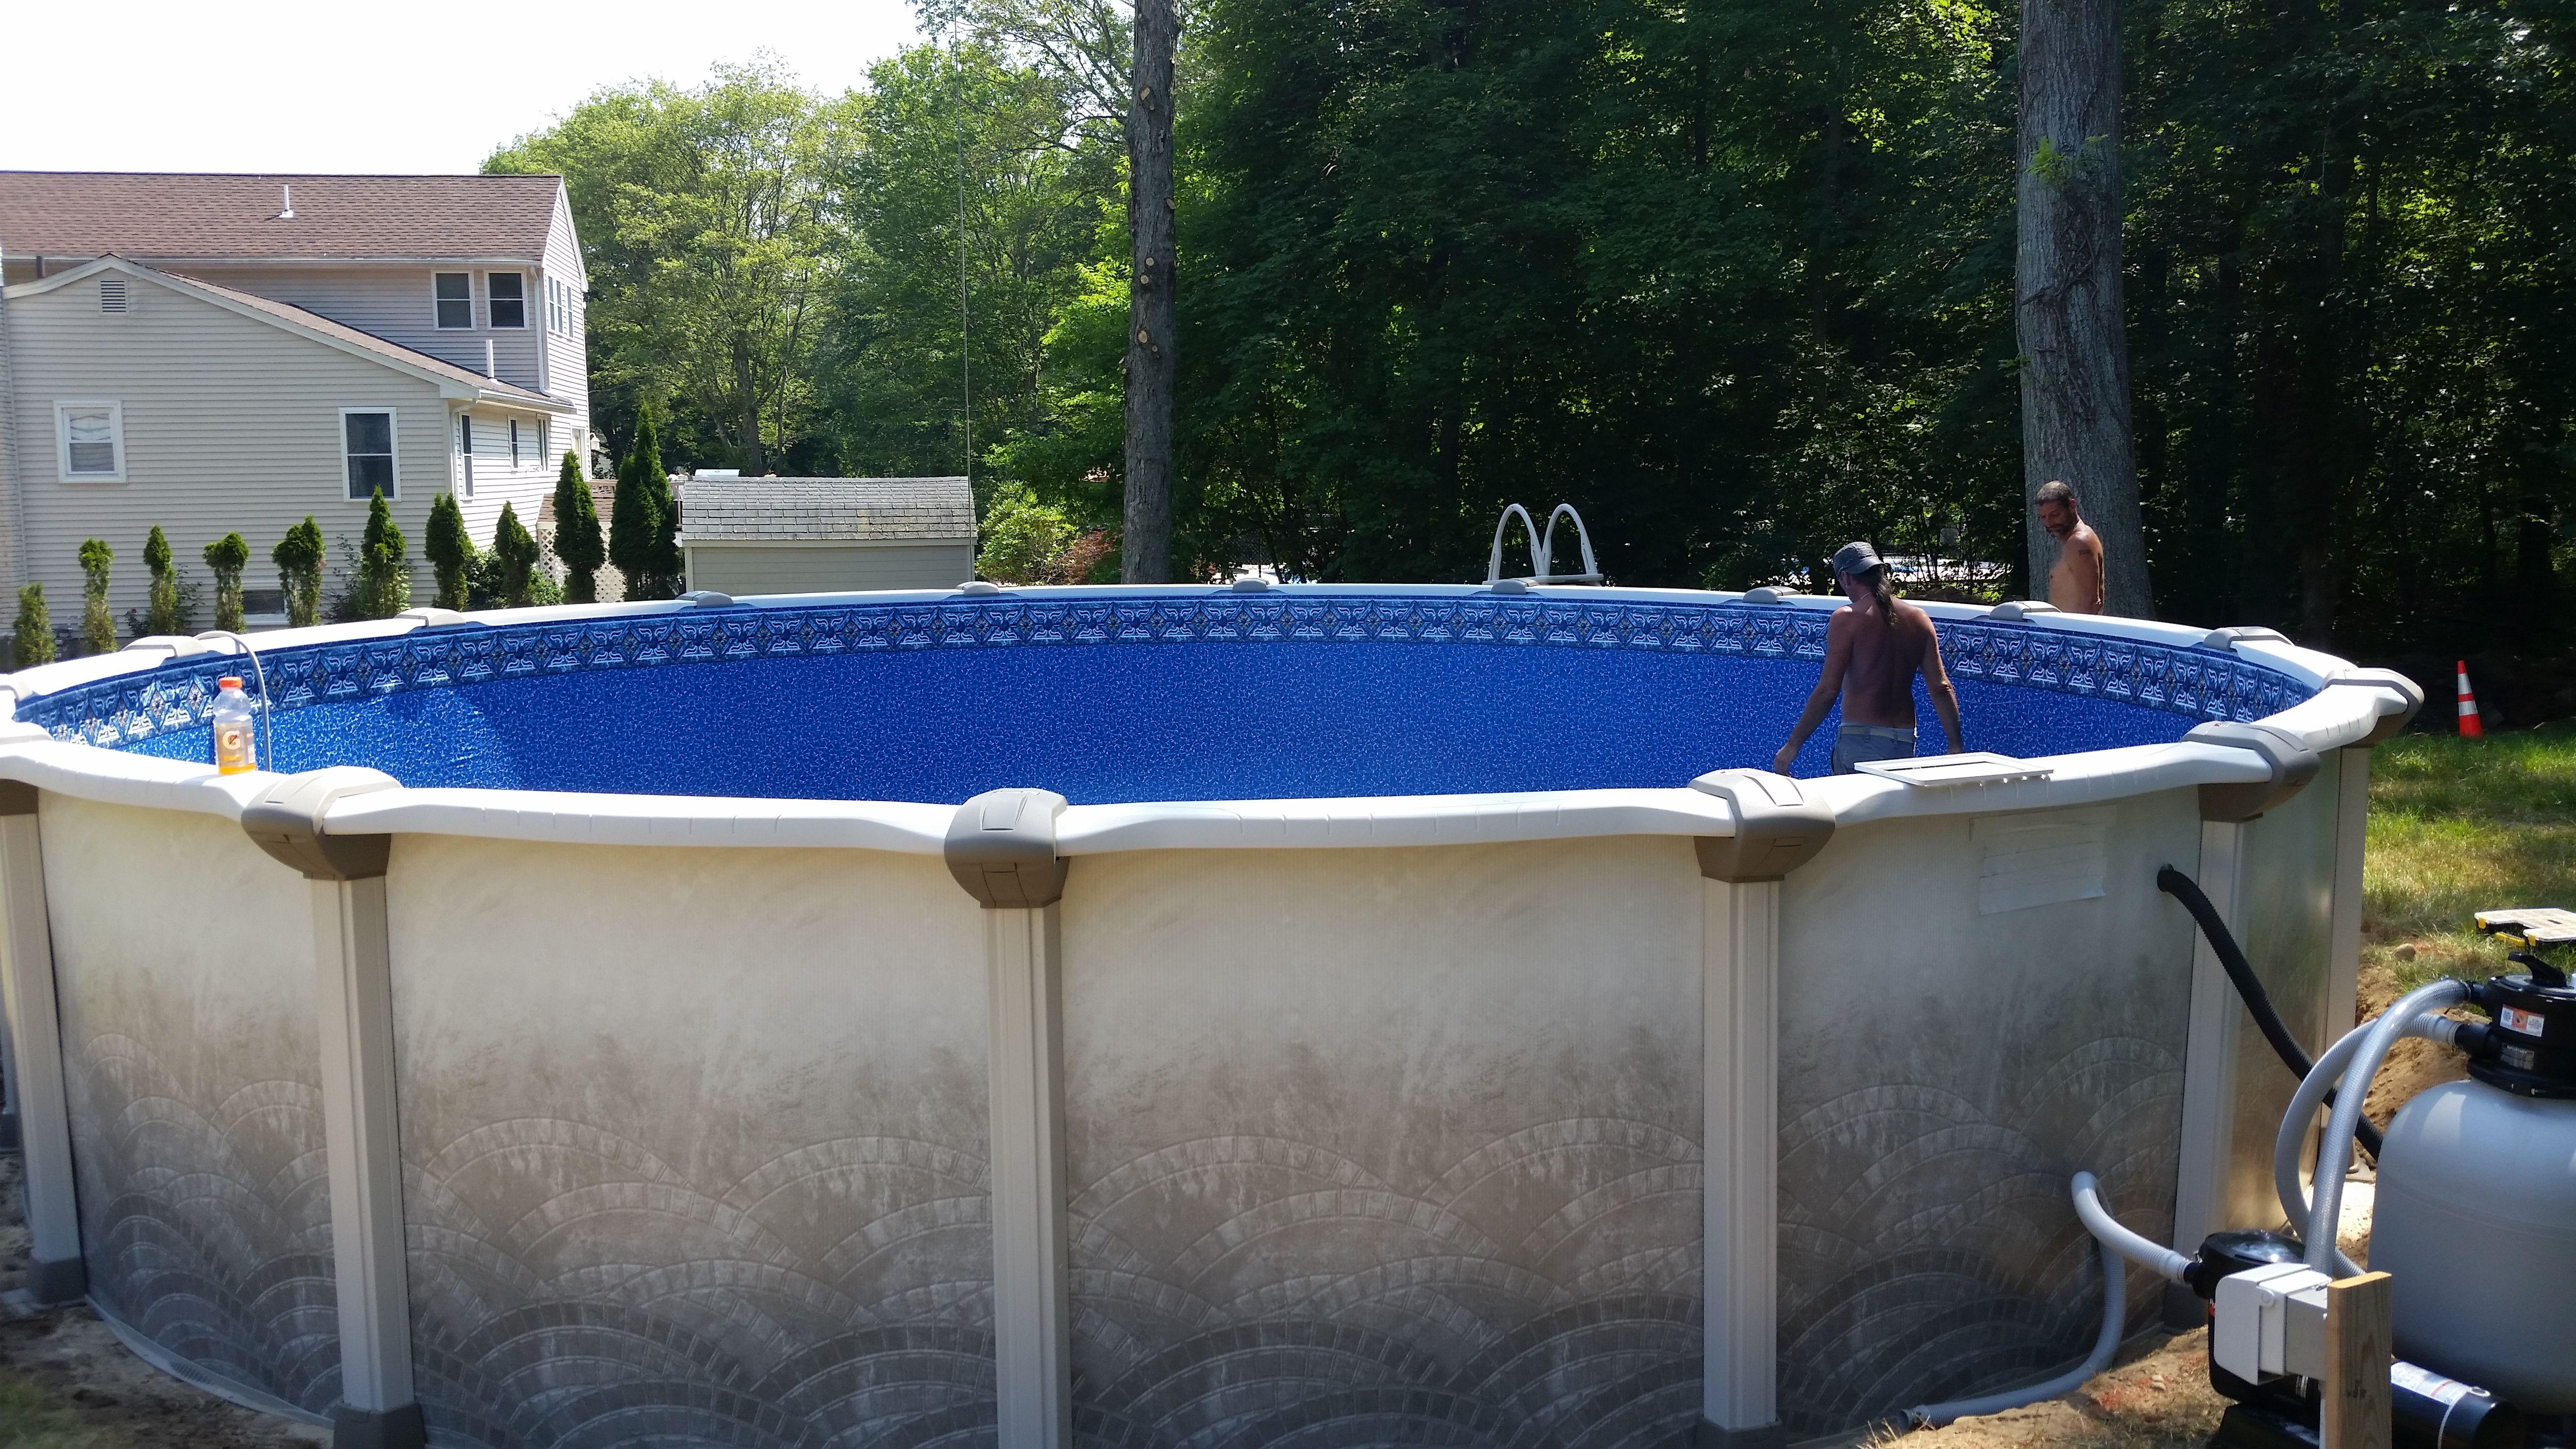 Mission hybrid above ground swimming pool.   Swimming pool liners, Install  pool liner, Above ground pool decks